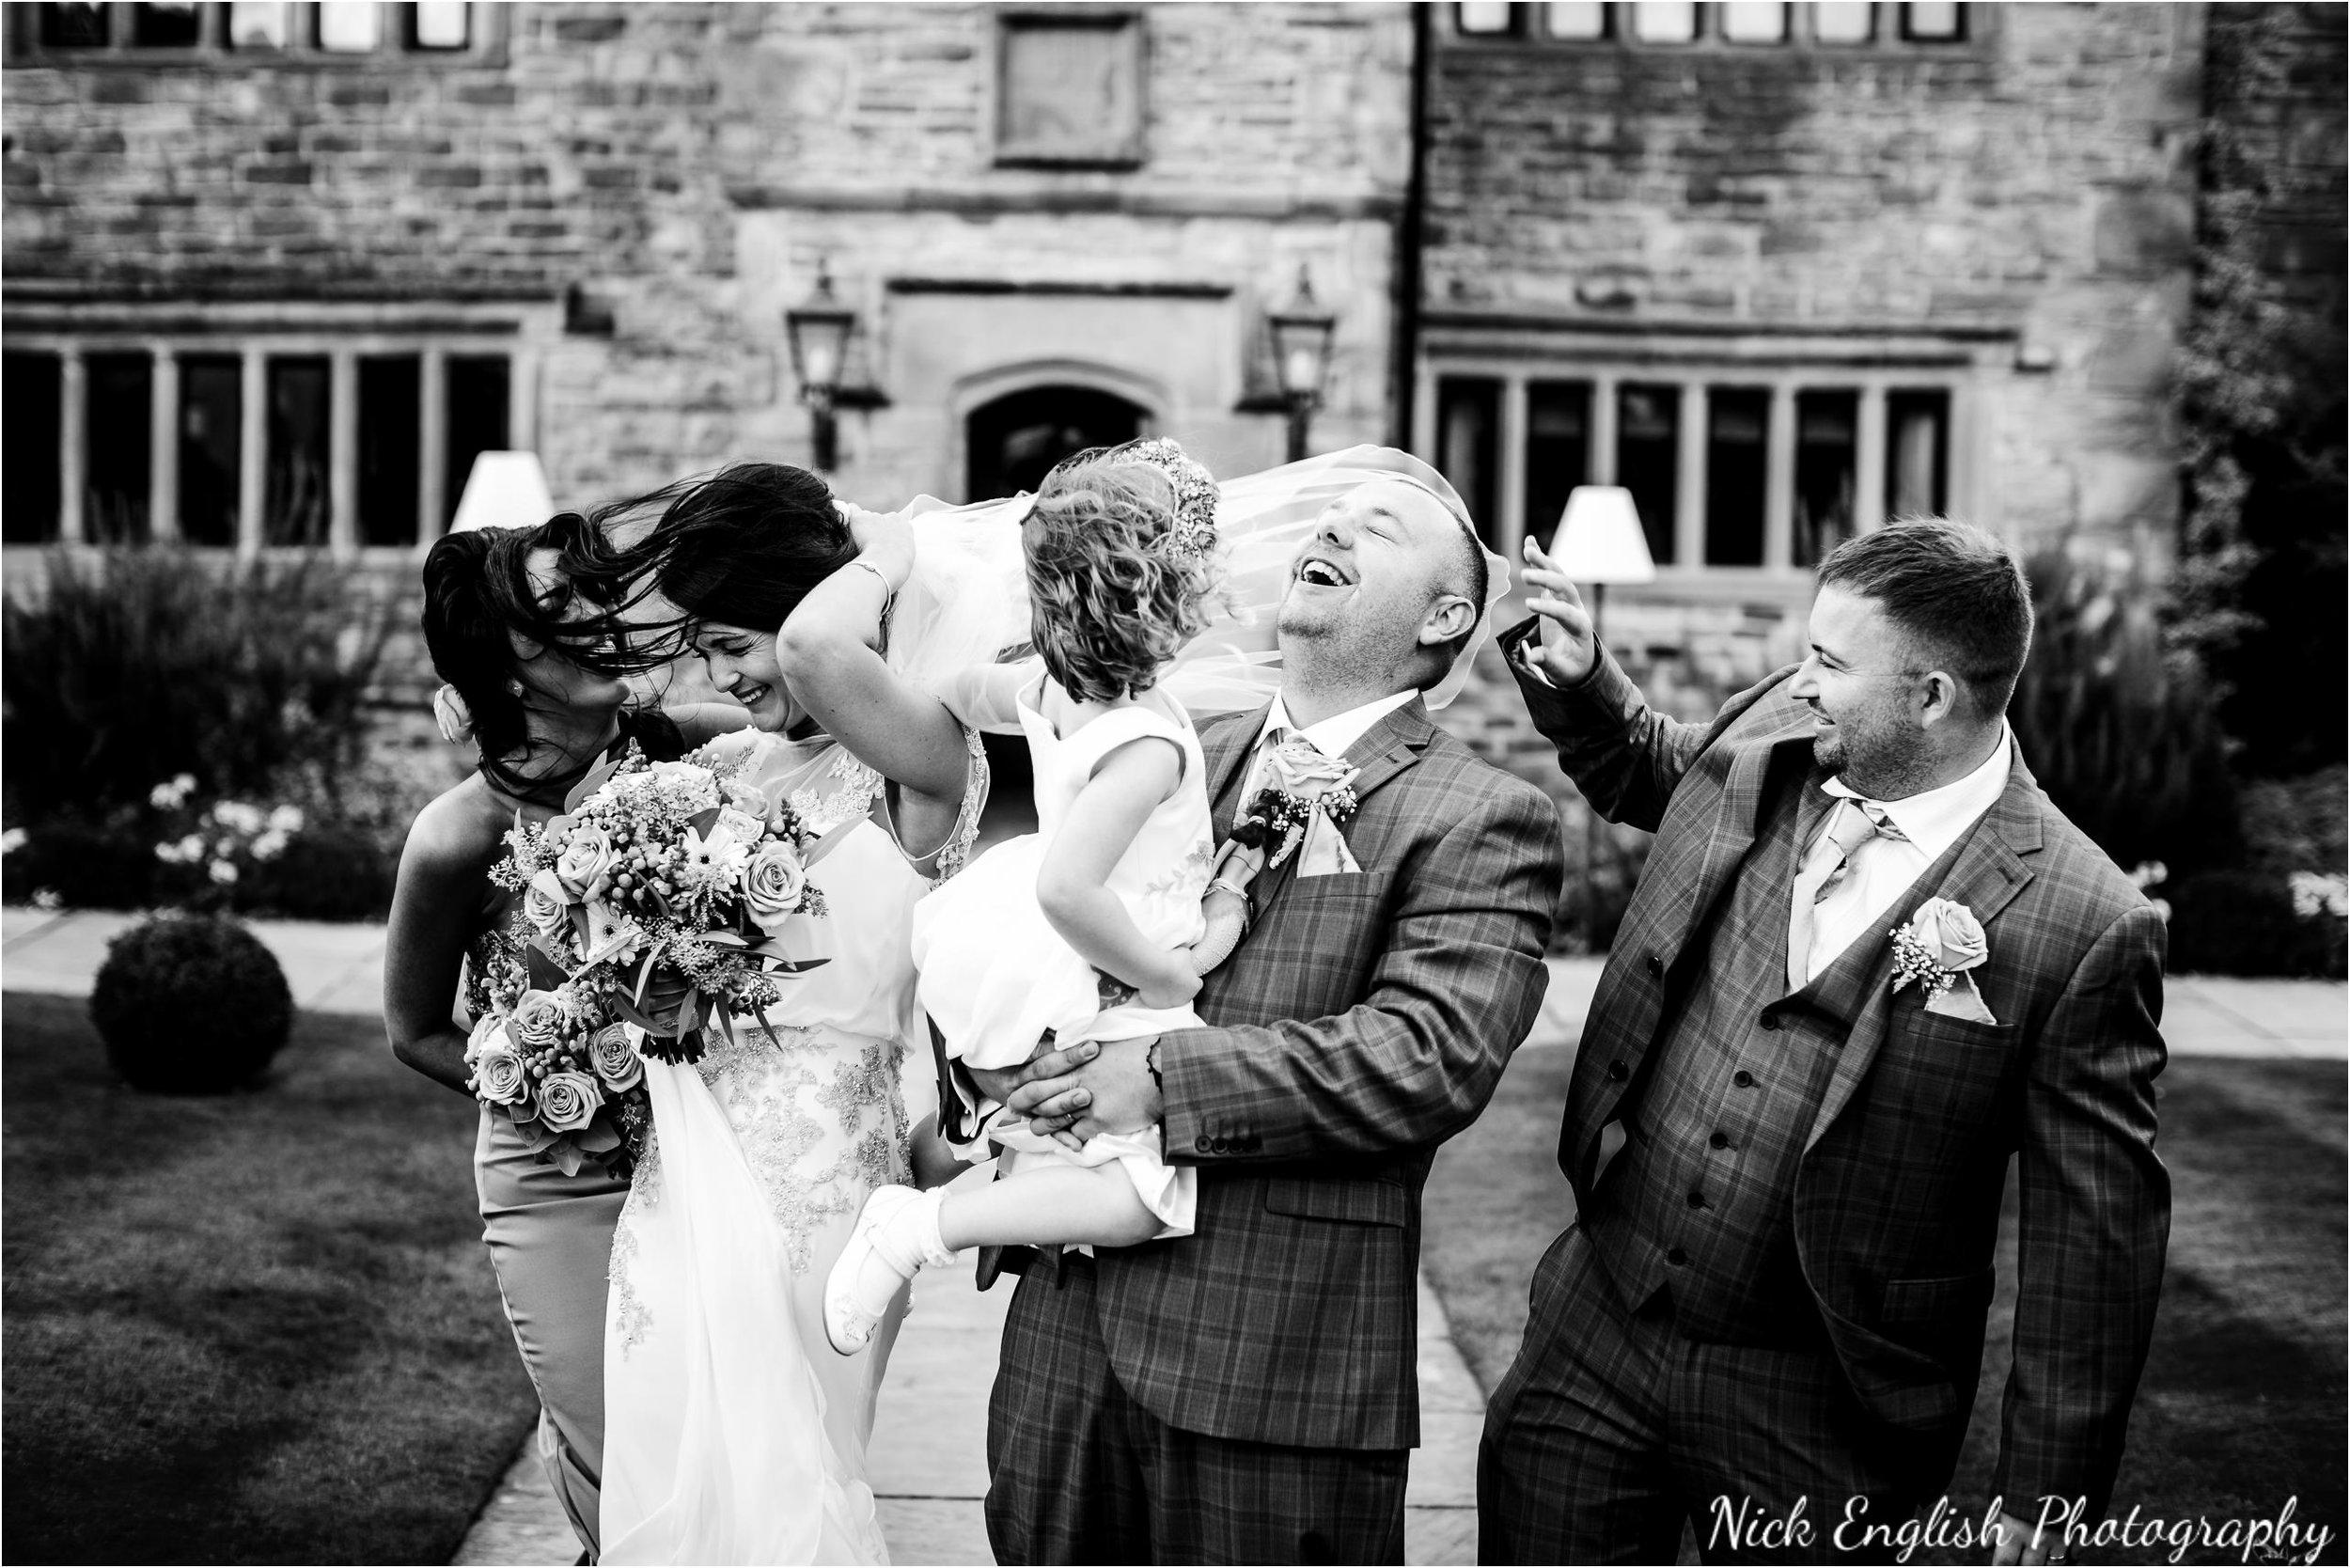 Stacey-Ash-Wedding-Photographs-Stanley-House-Preston-Lancashire-121.jpg